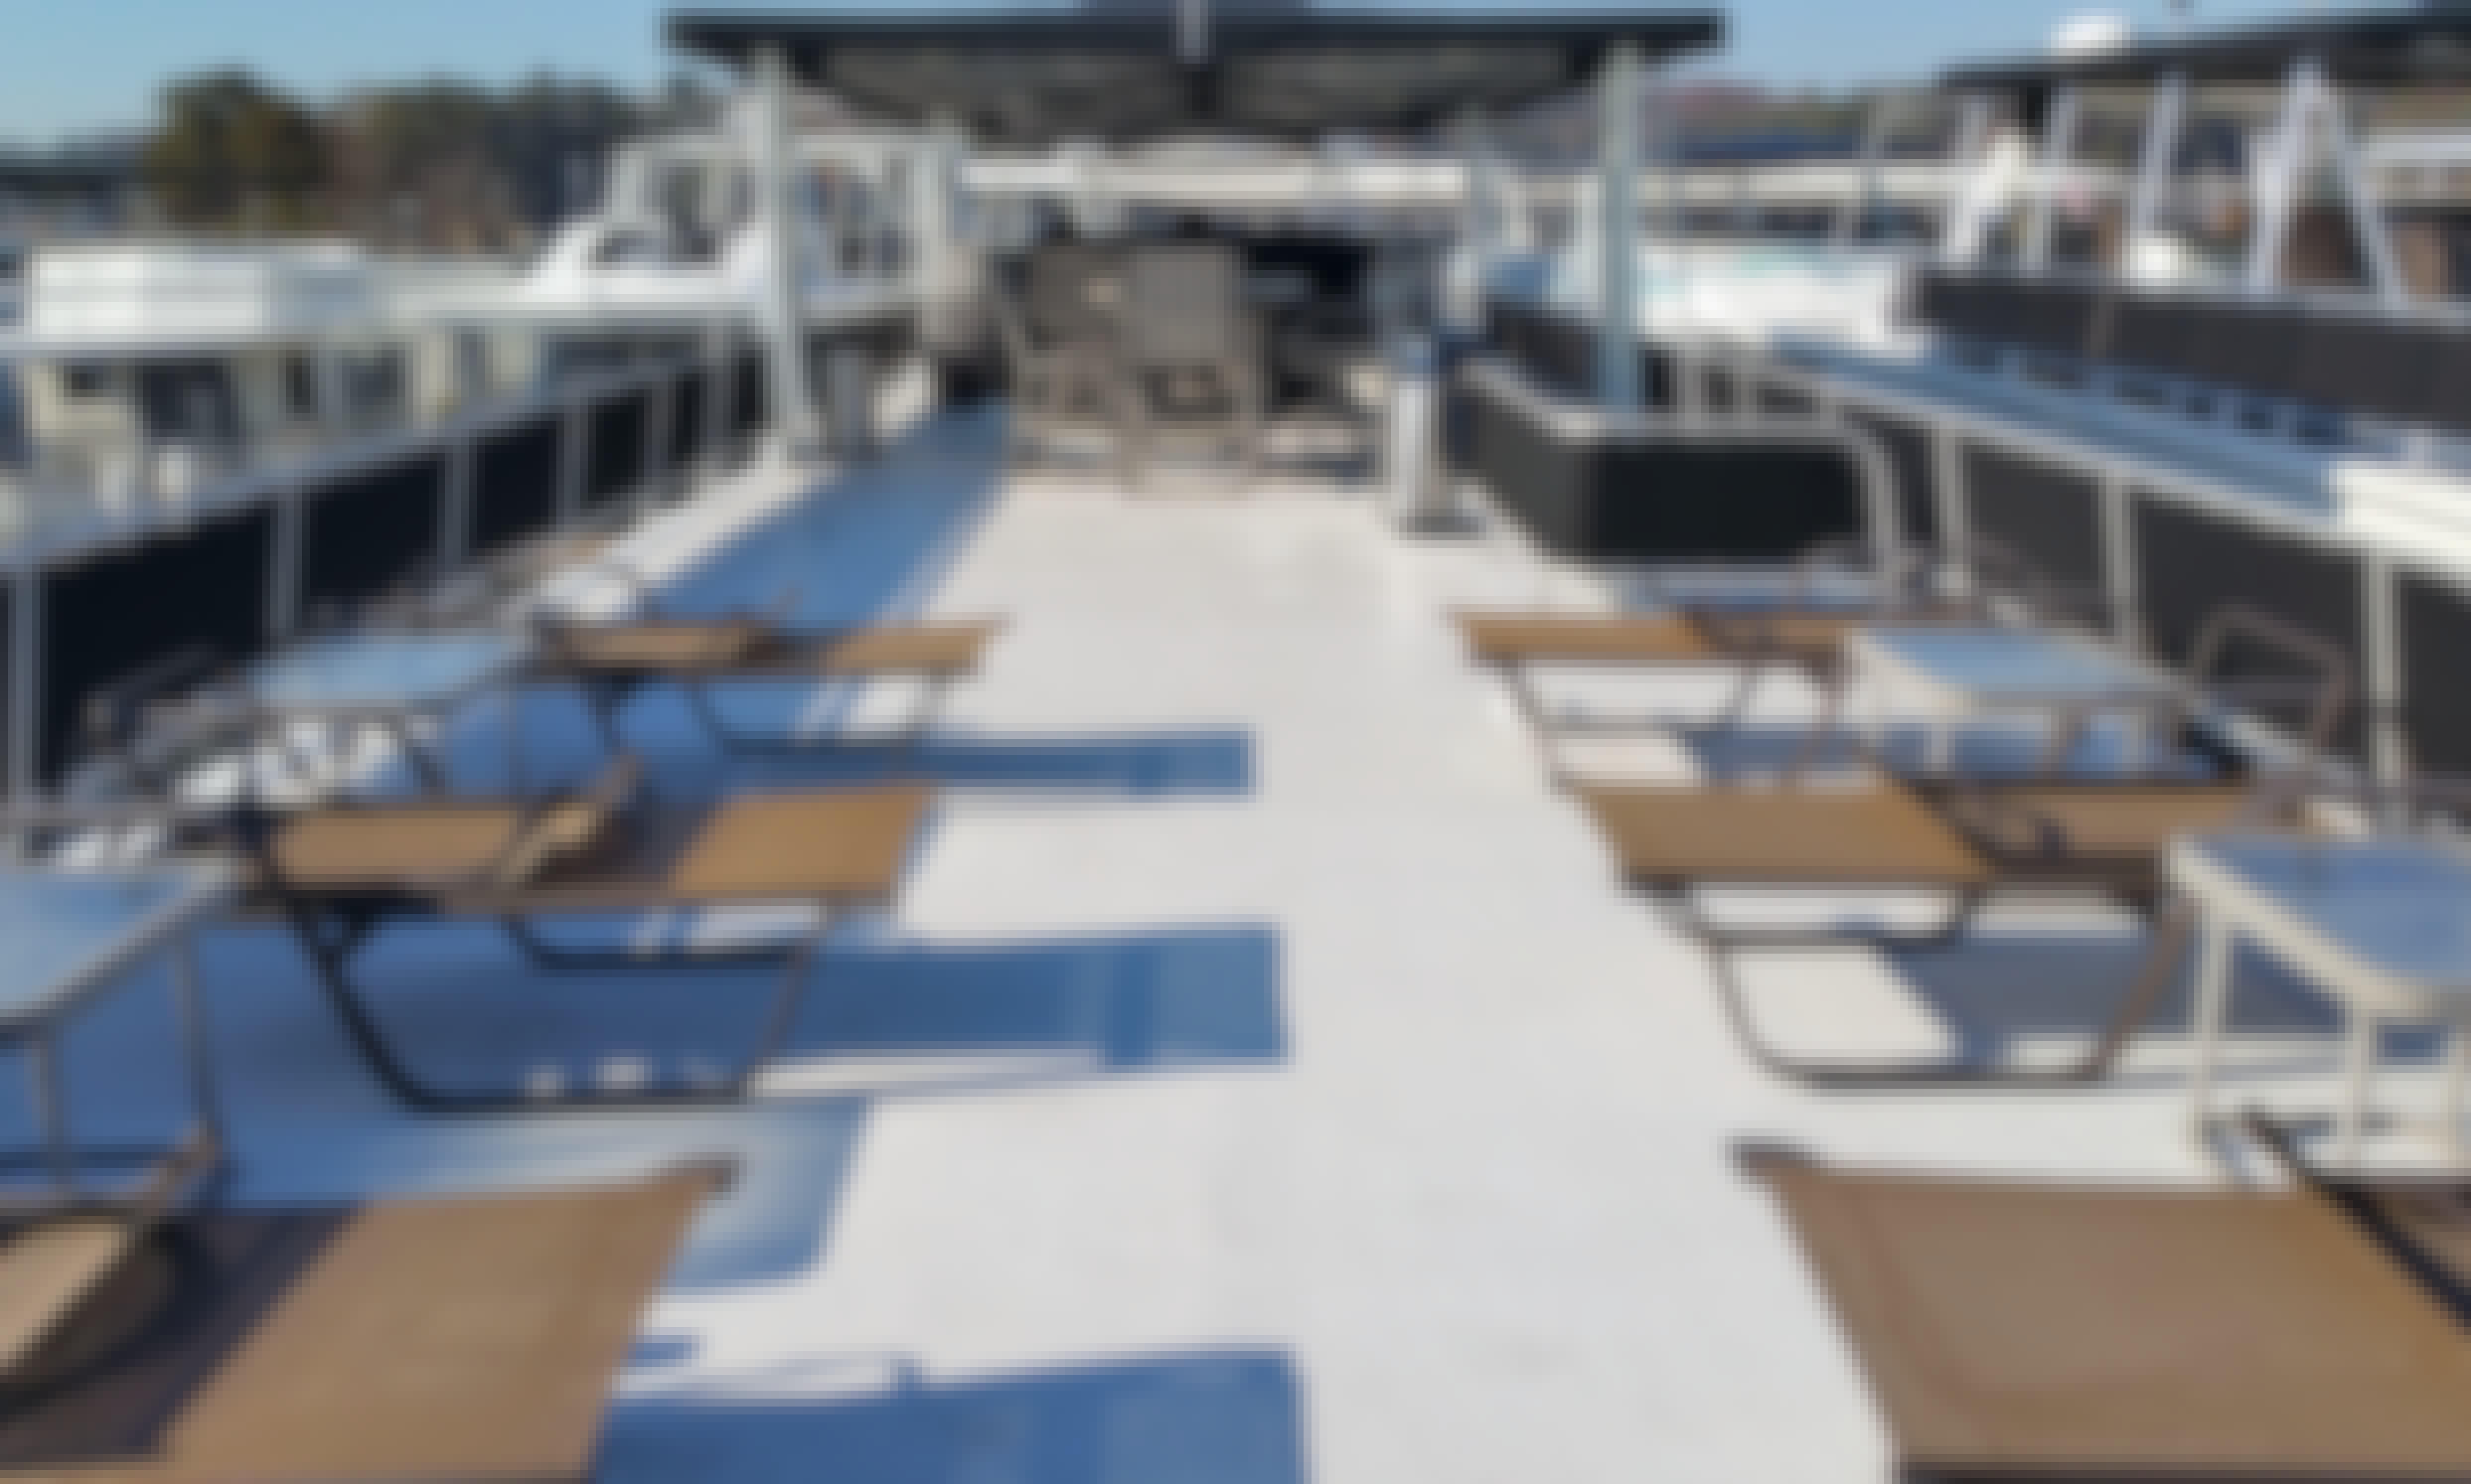 Luxury Stardust Cruiser 70 Houseboat Rental in Buford, Georgia